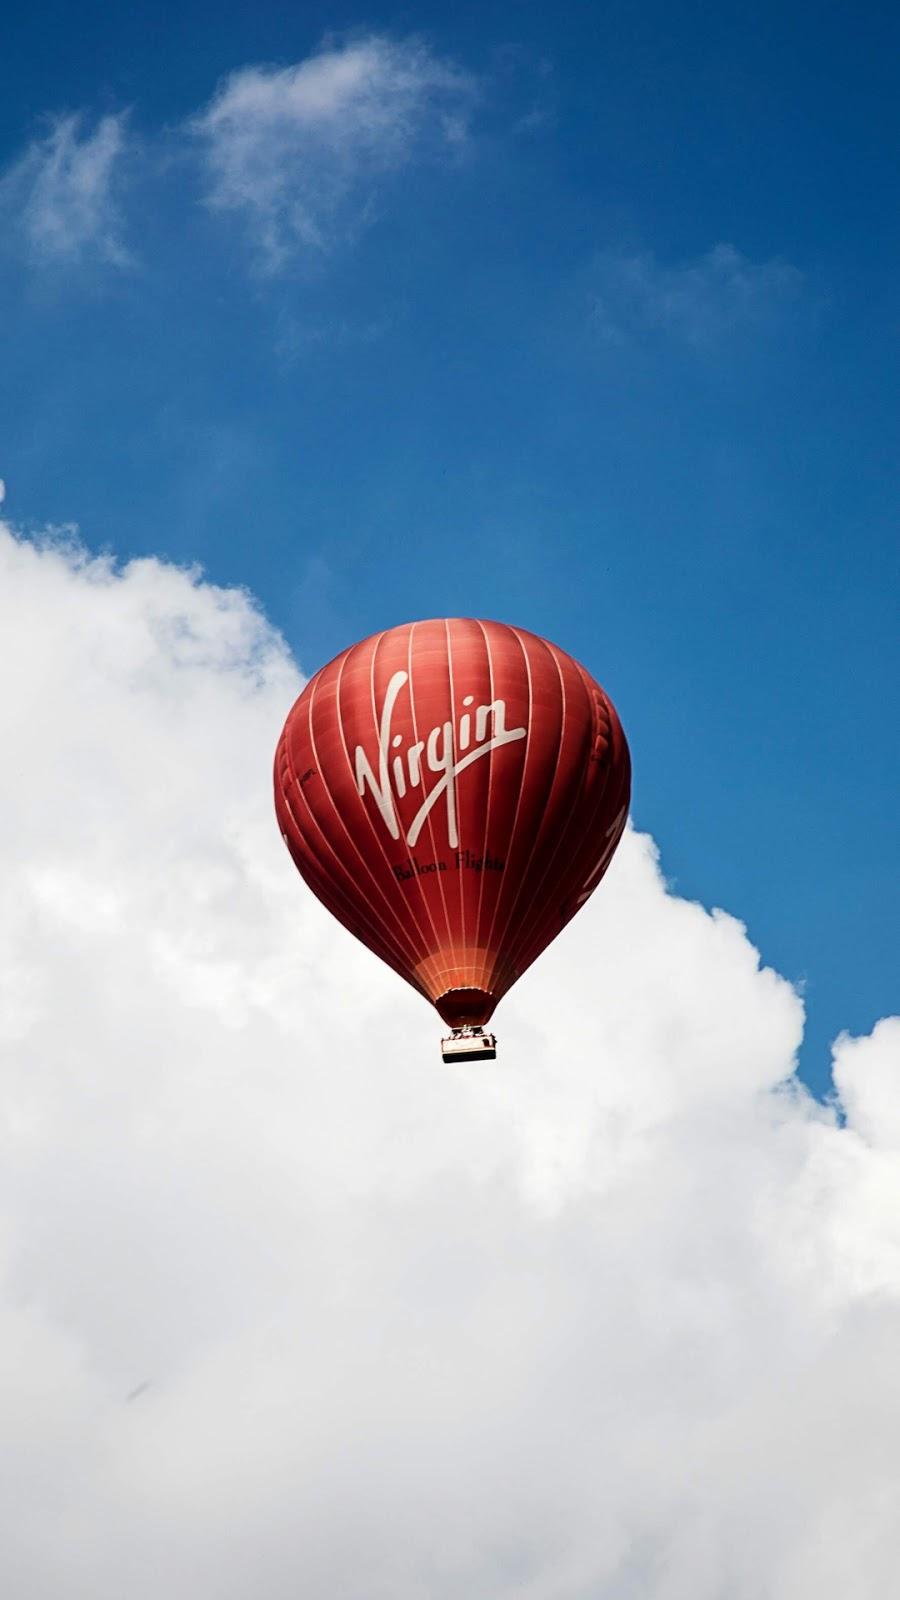 Virgin in the sky